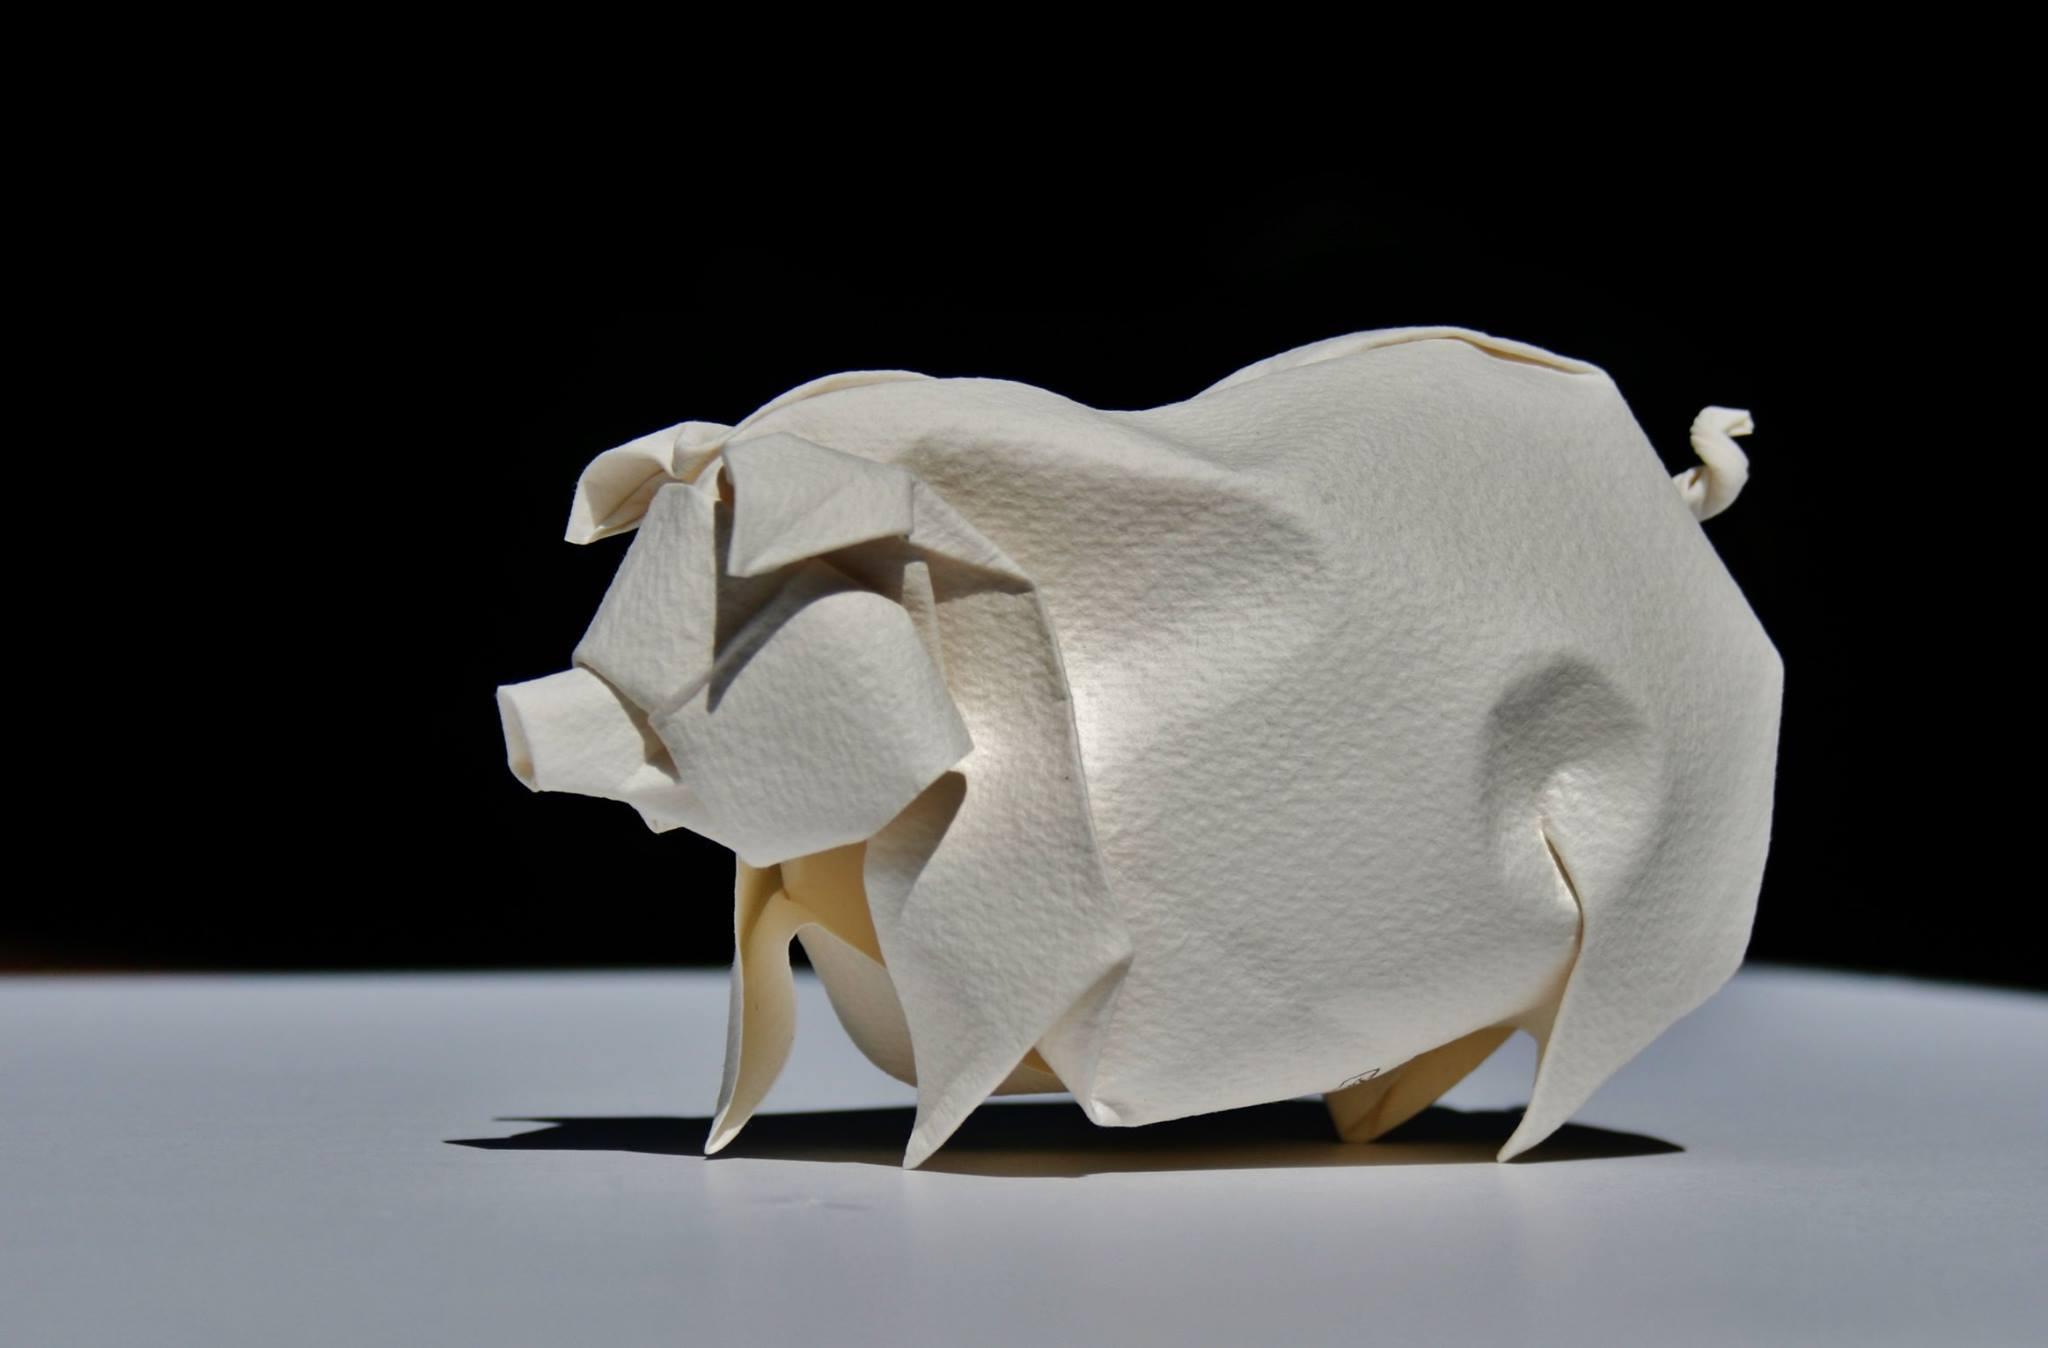 Hoàng Tiến Quyết Wet Fold Origami Pig